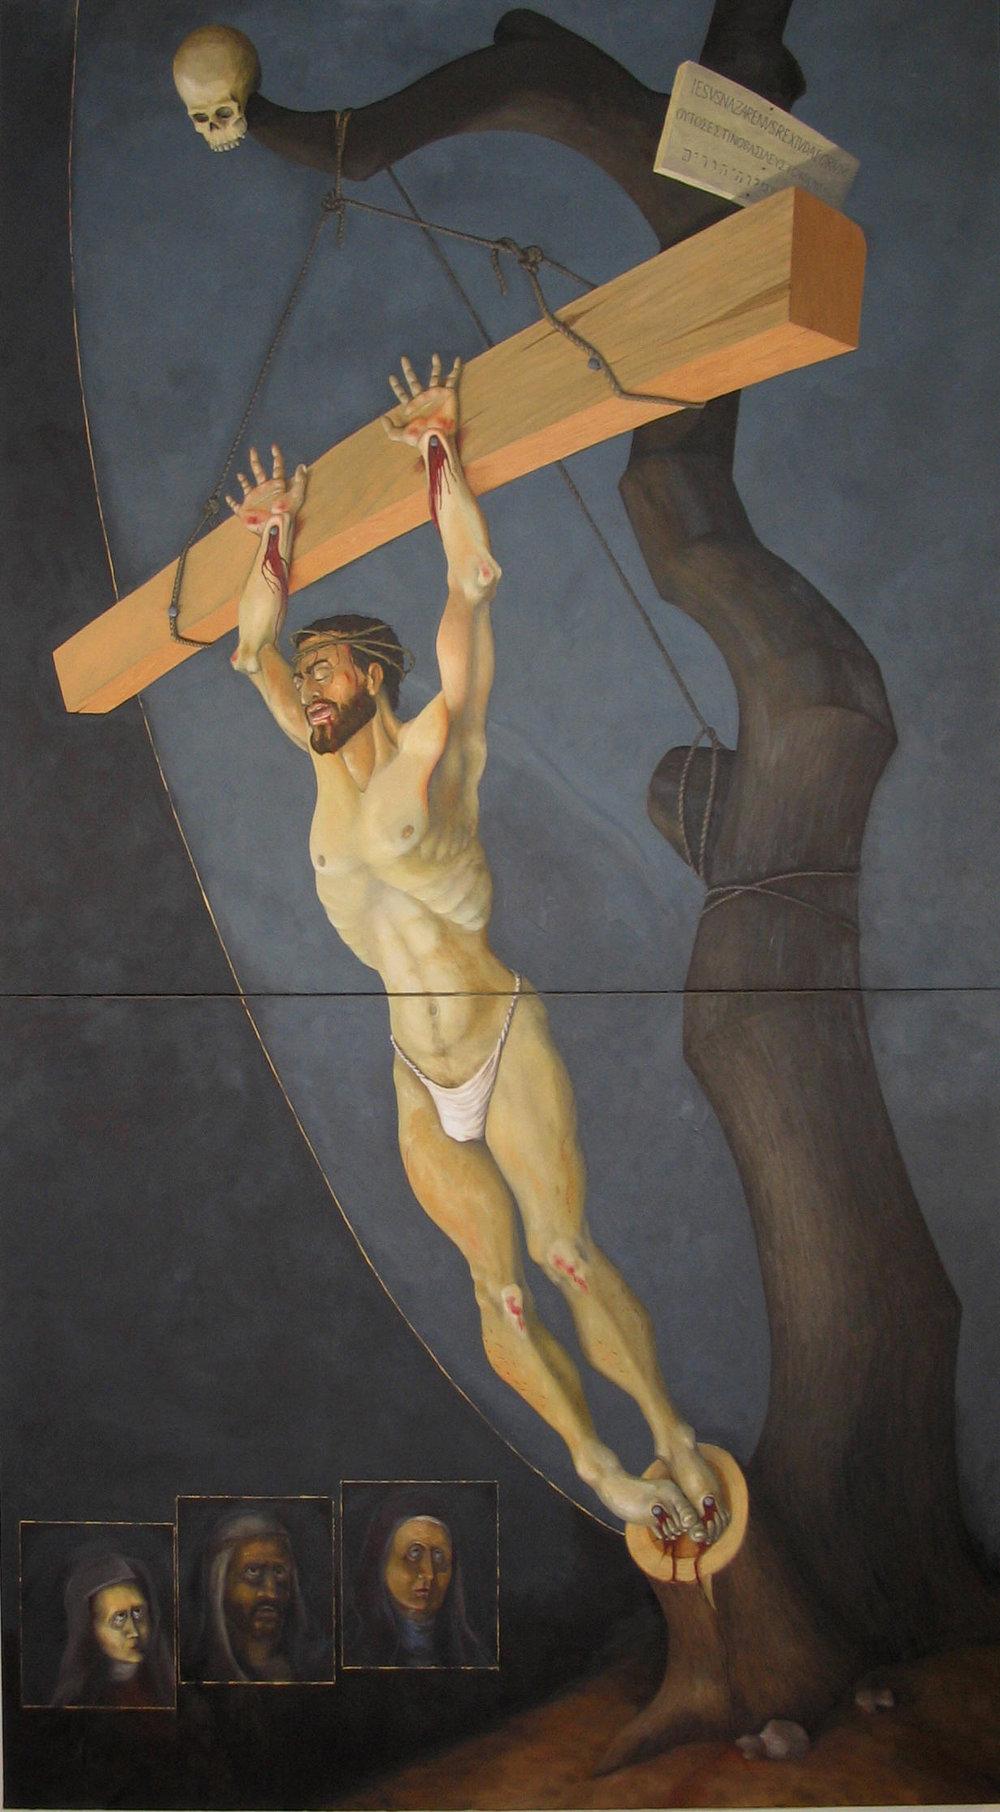 Crucifixion #2